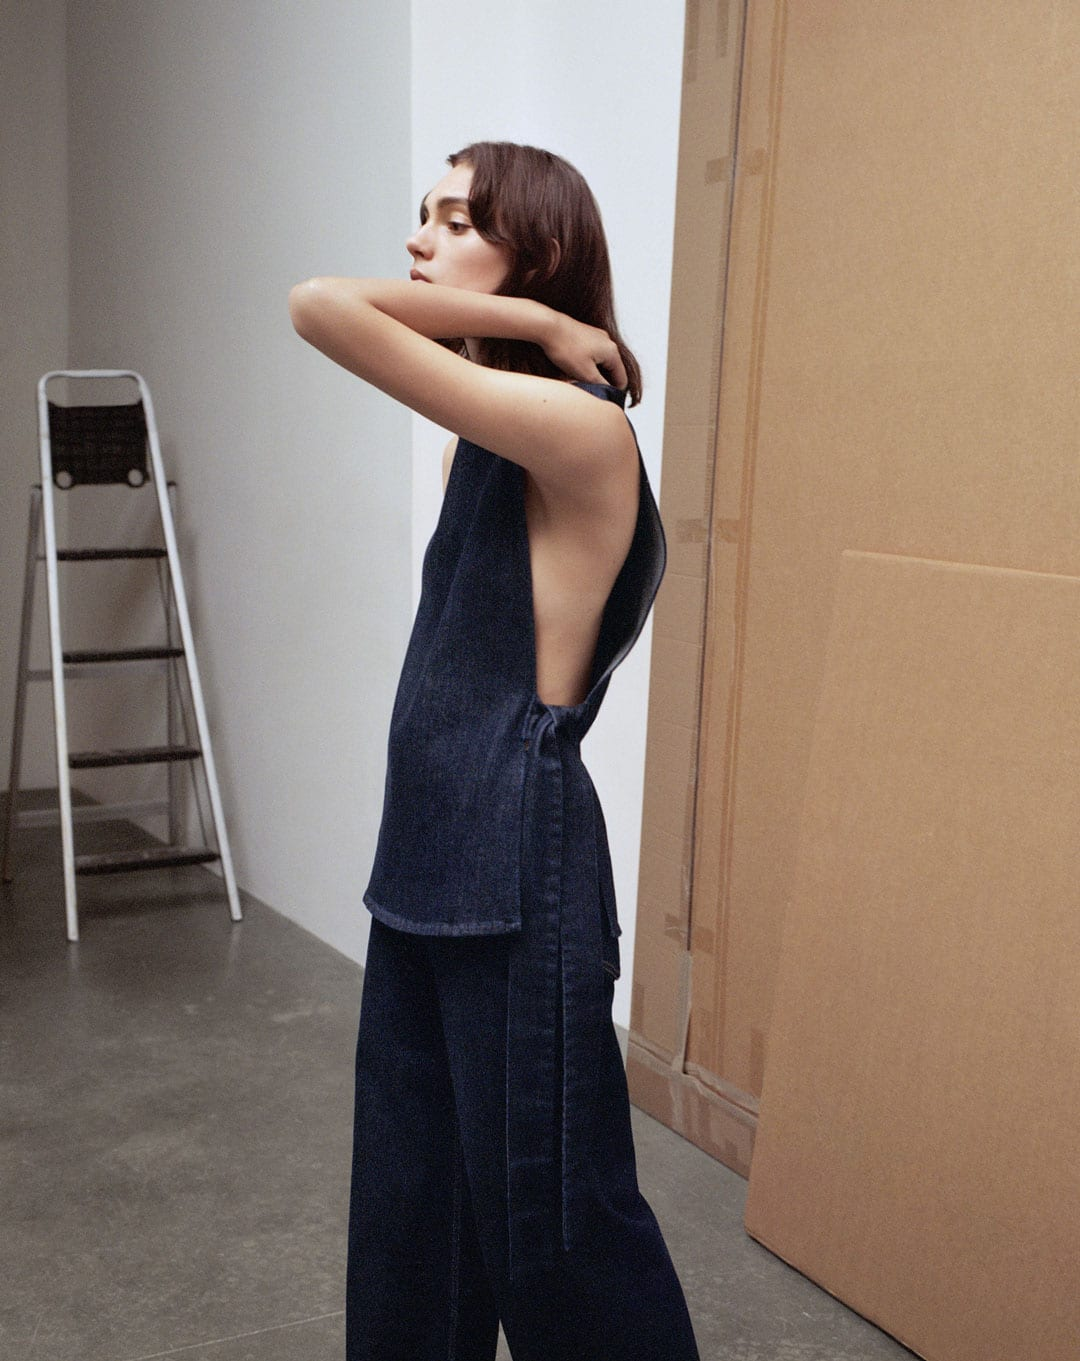 COS SS17 Womenswear Campaign